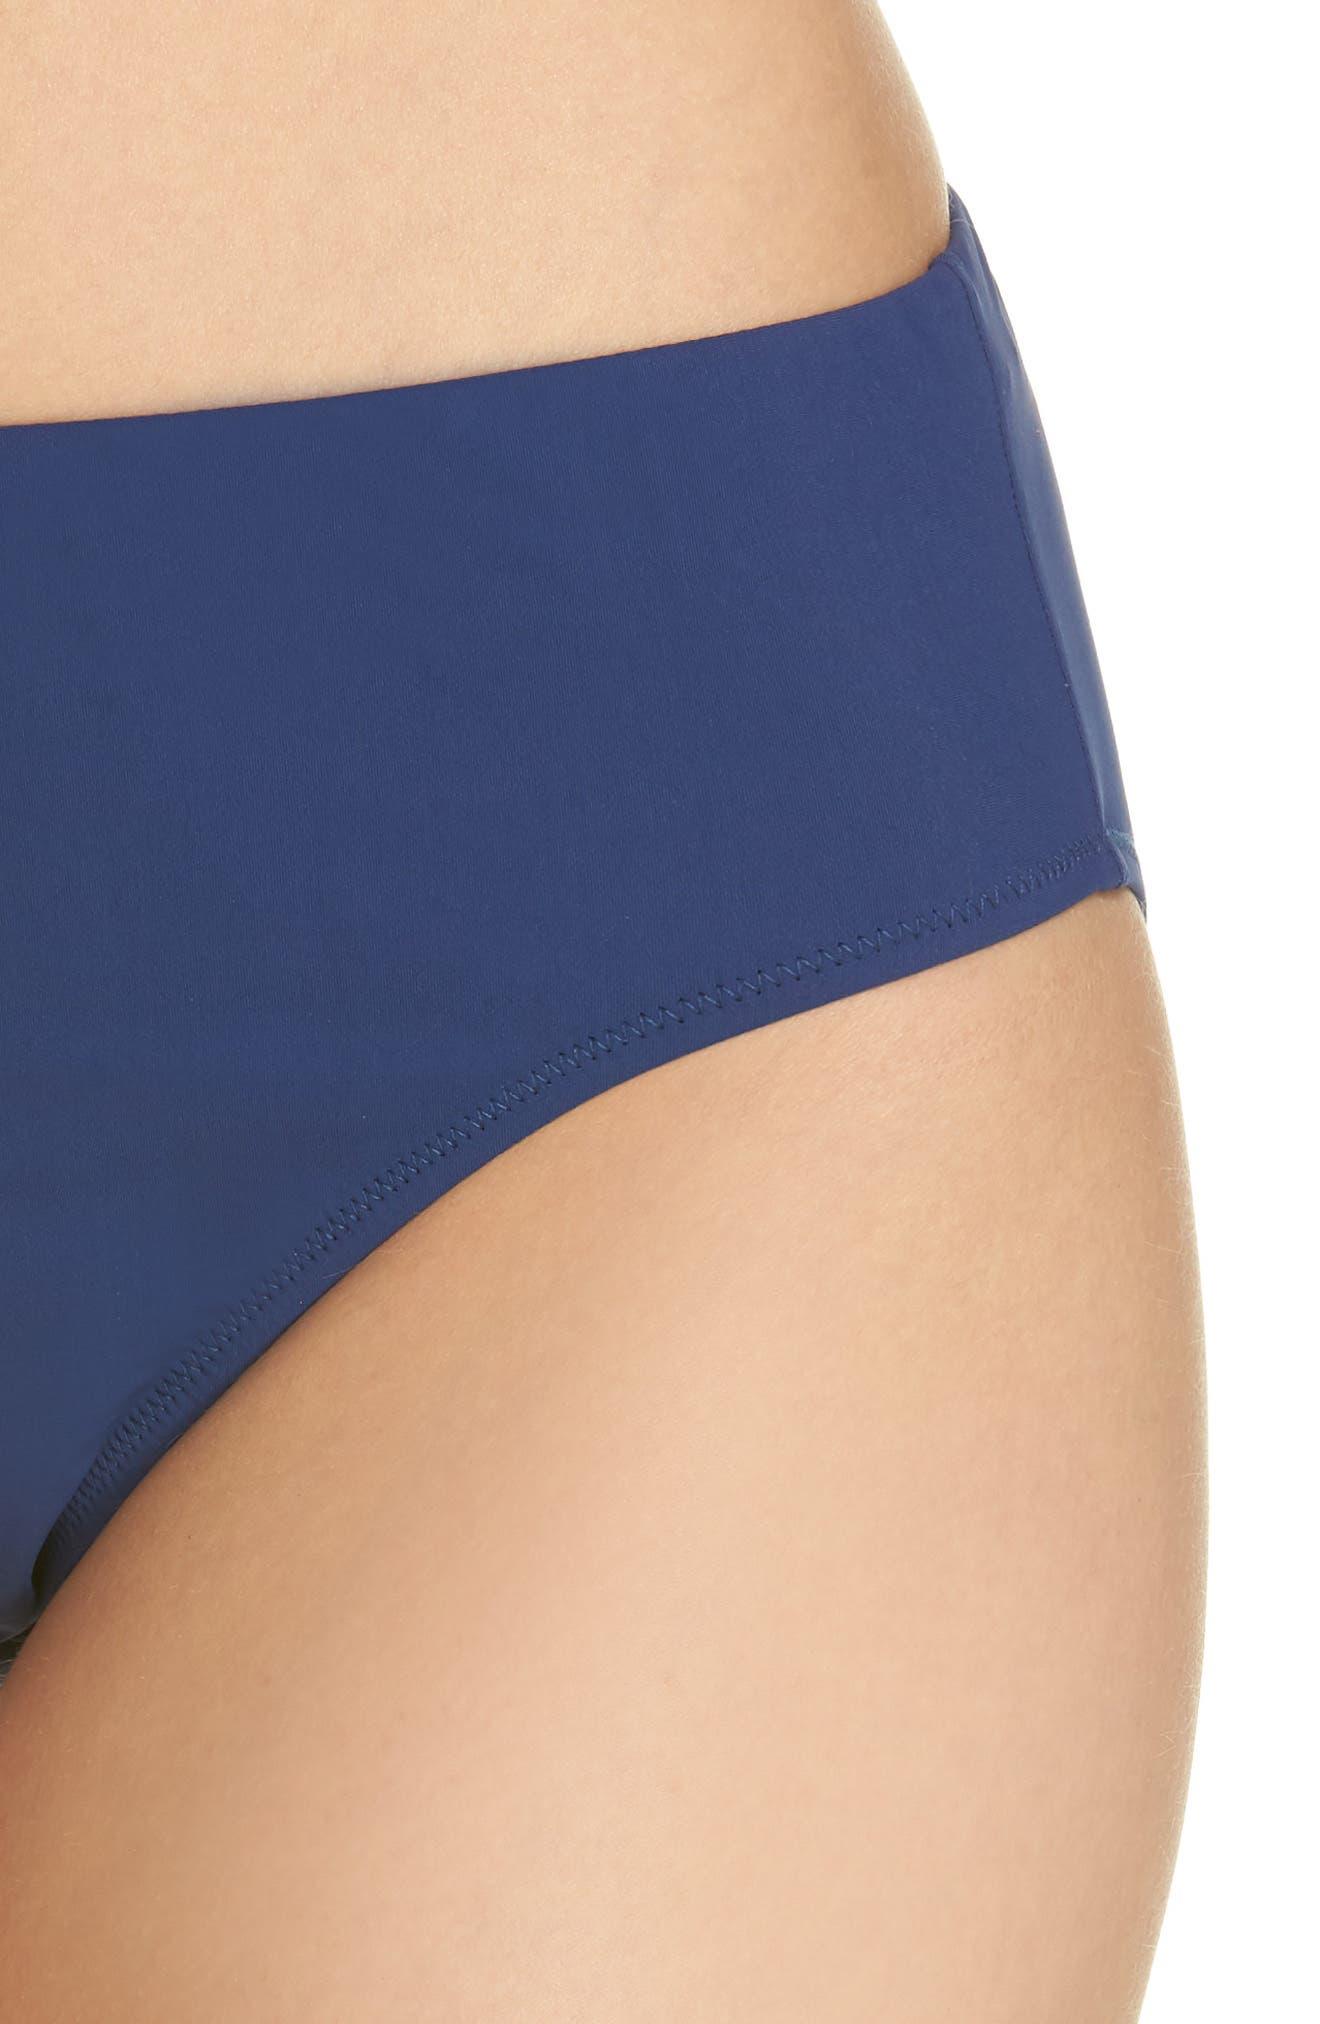 PROFILE BY GOTTEX,                             Hipster Bikini Bottoms,                             Alternate thumbnail 4, color,                             427